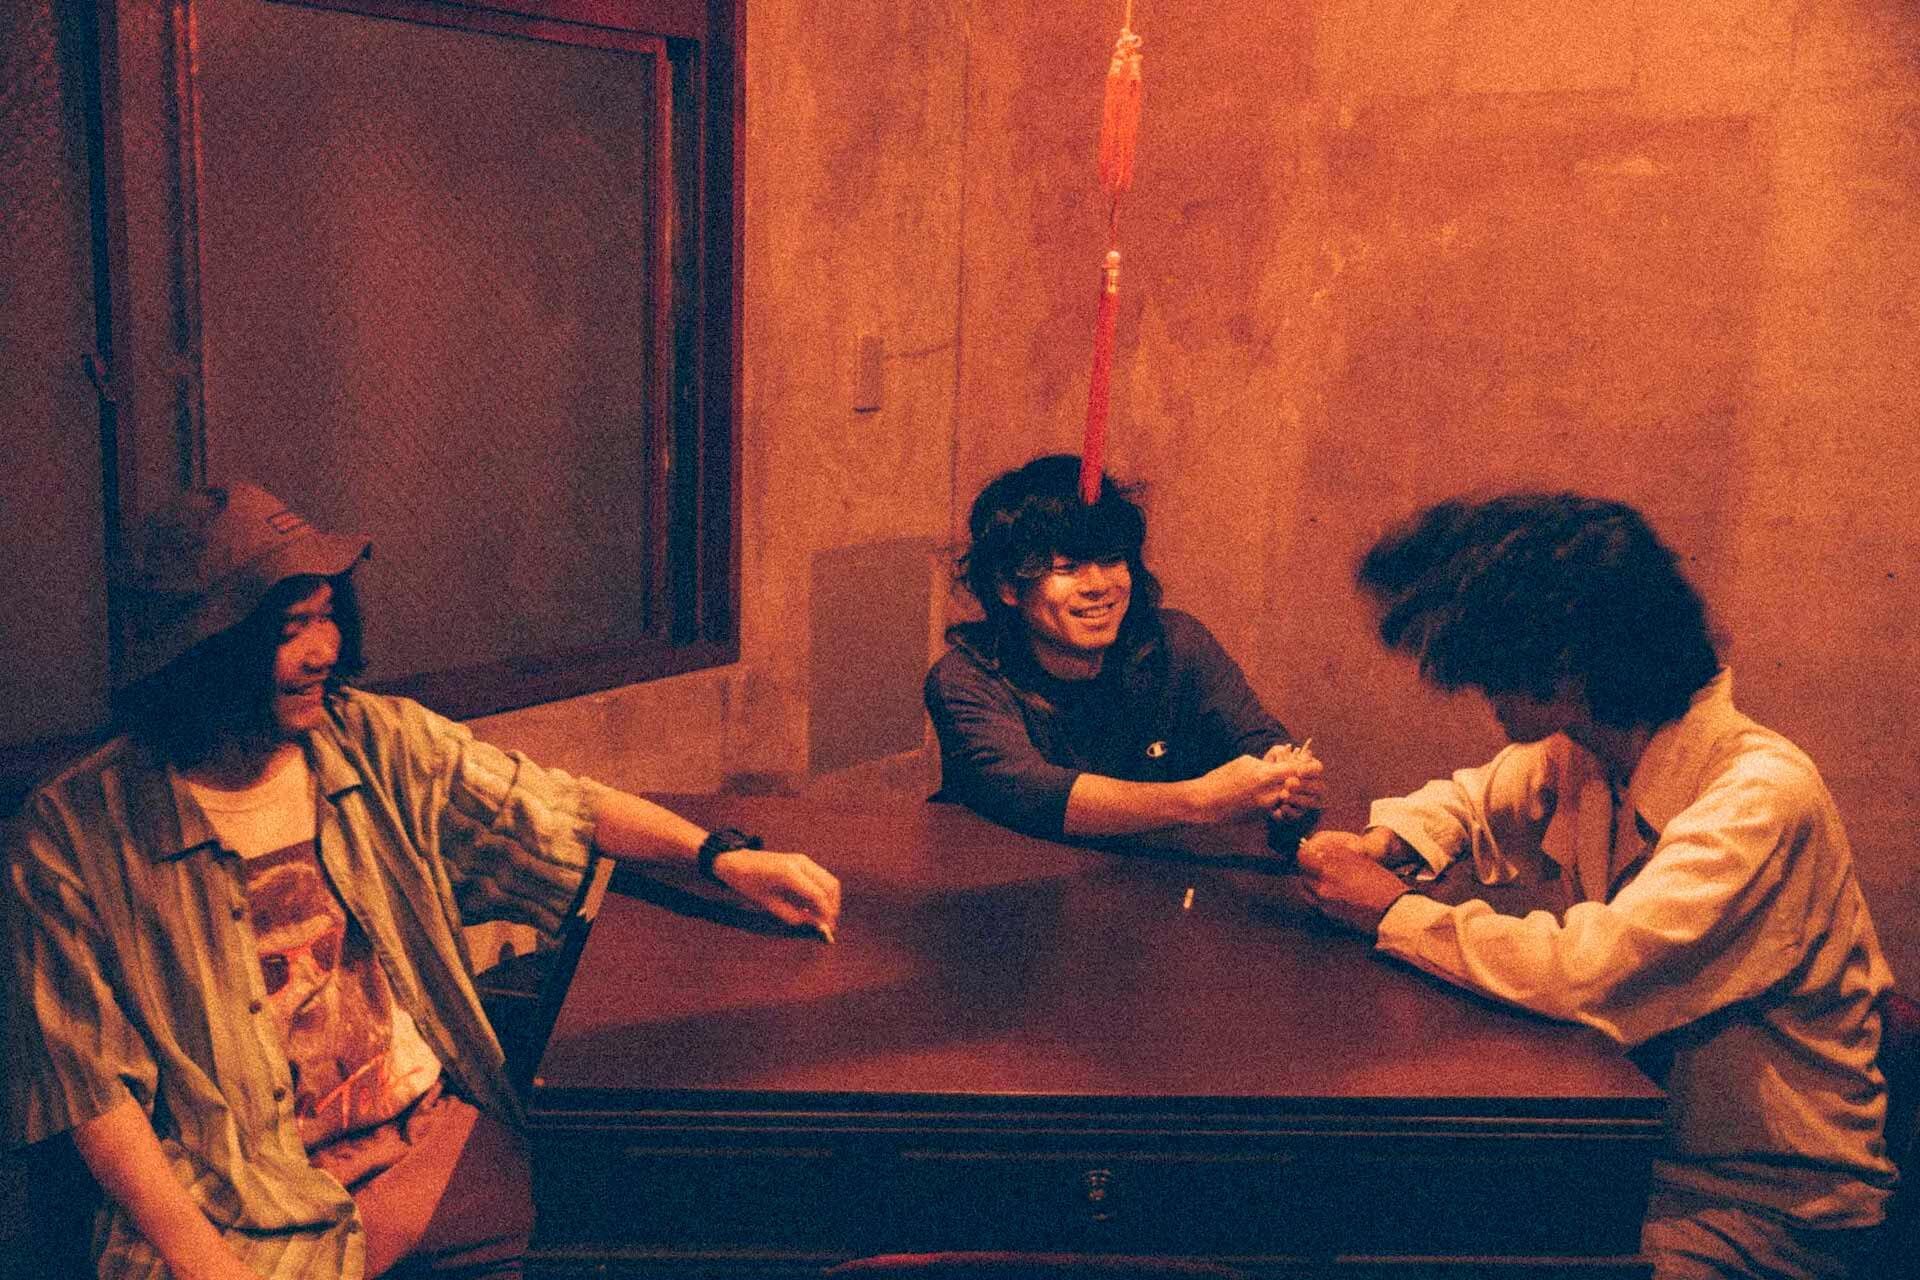 Tempalay × ドミコ × MONO NO AWARE「中国巡演」鼎談|盟友となった中国ツアーを振り返る interview1007_chinatour-0744